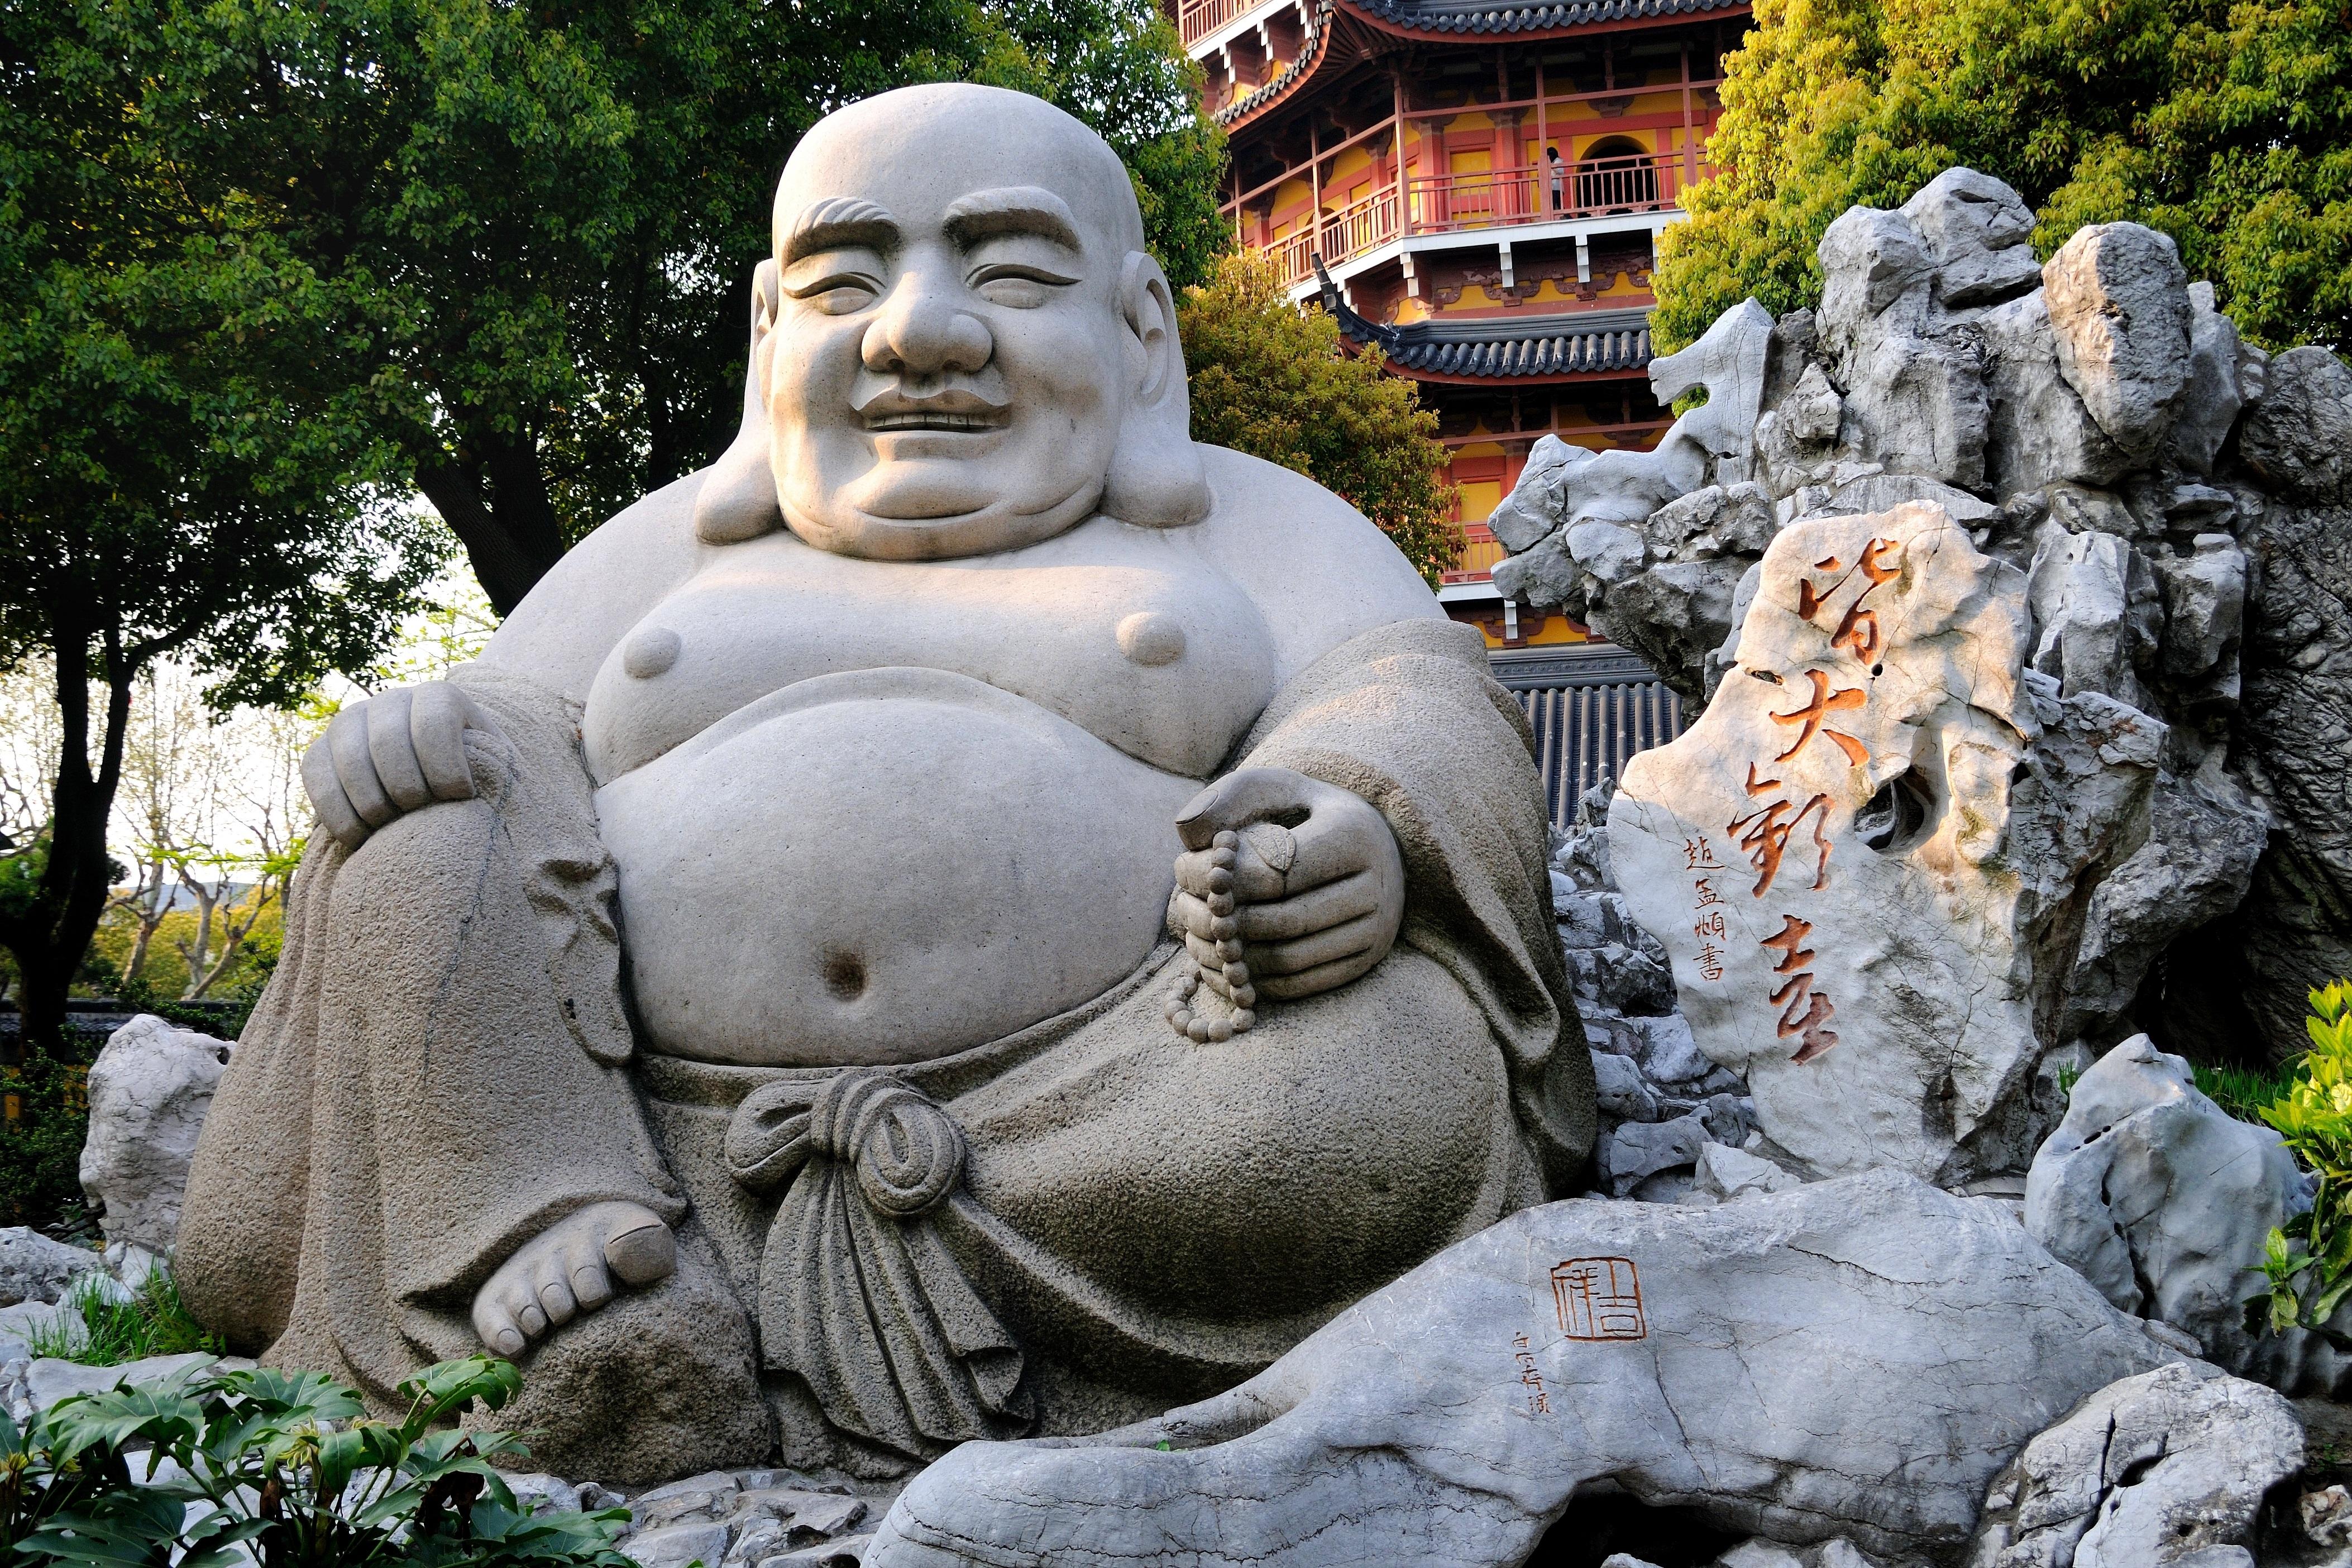 Gratis svart ler Thai sex massasje